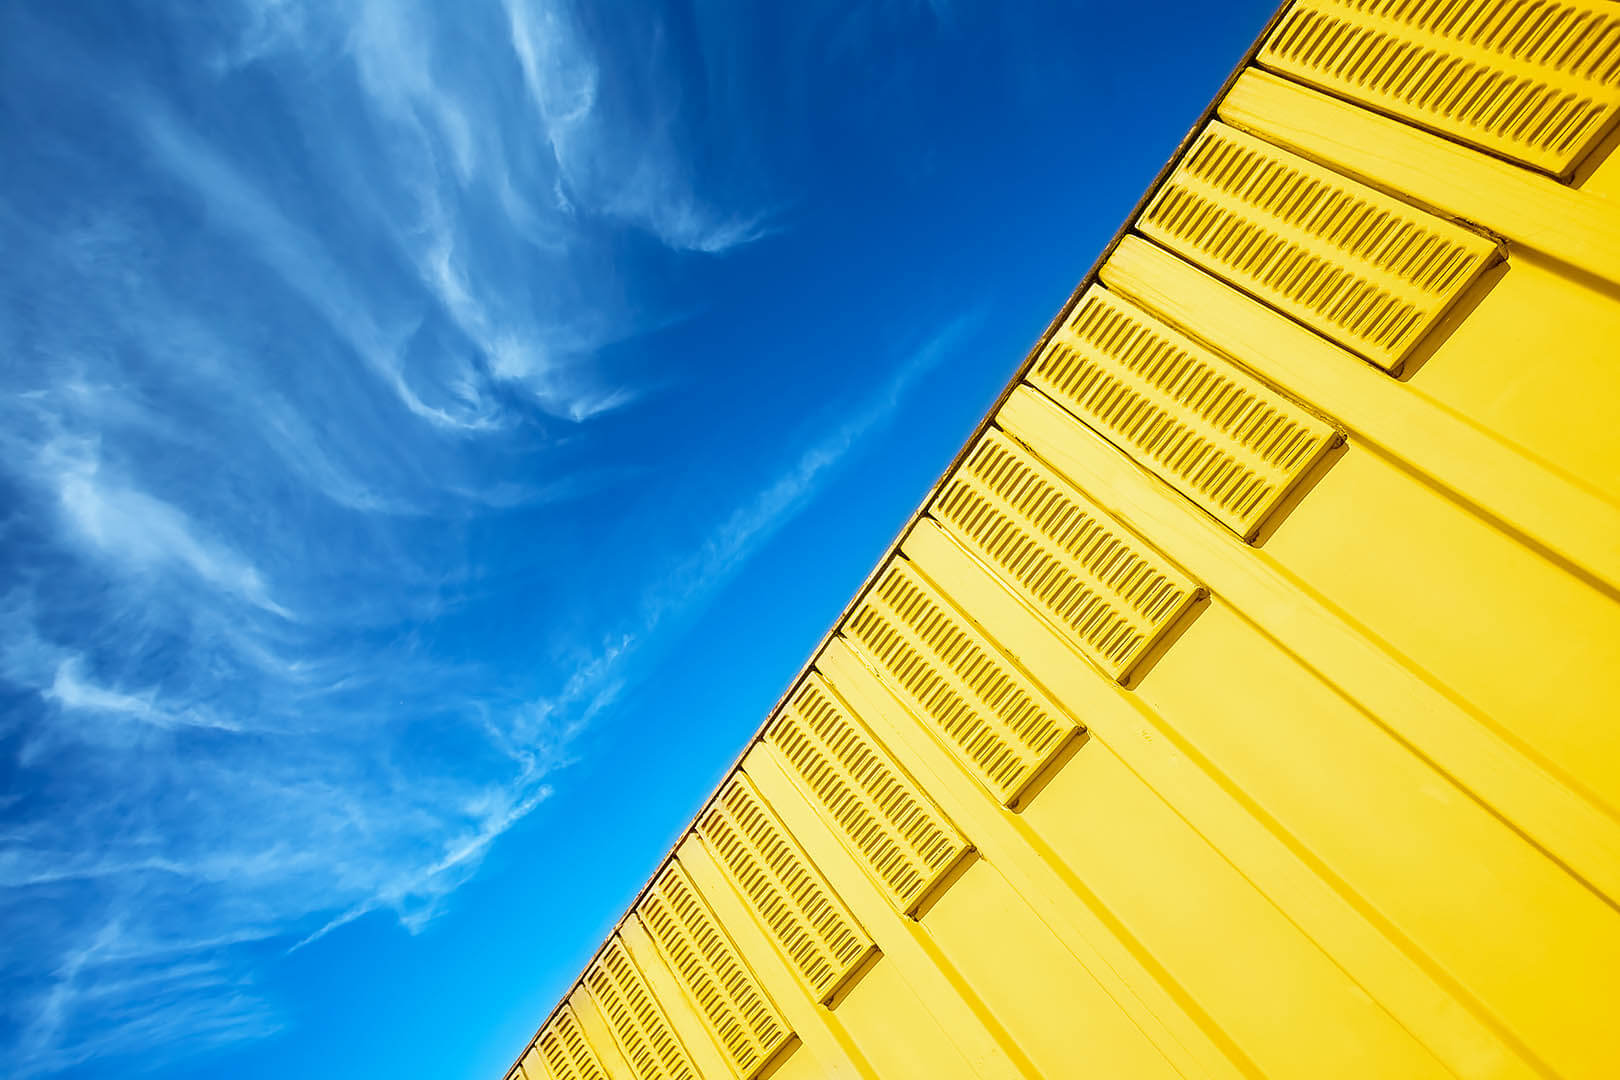 Yellow Freight